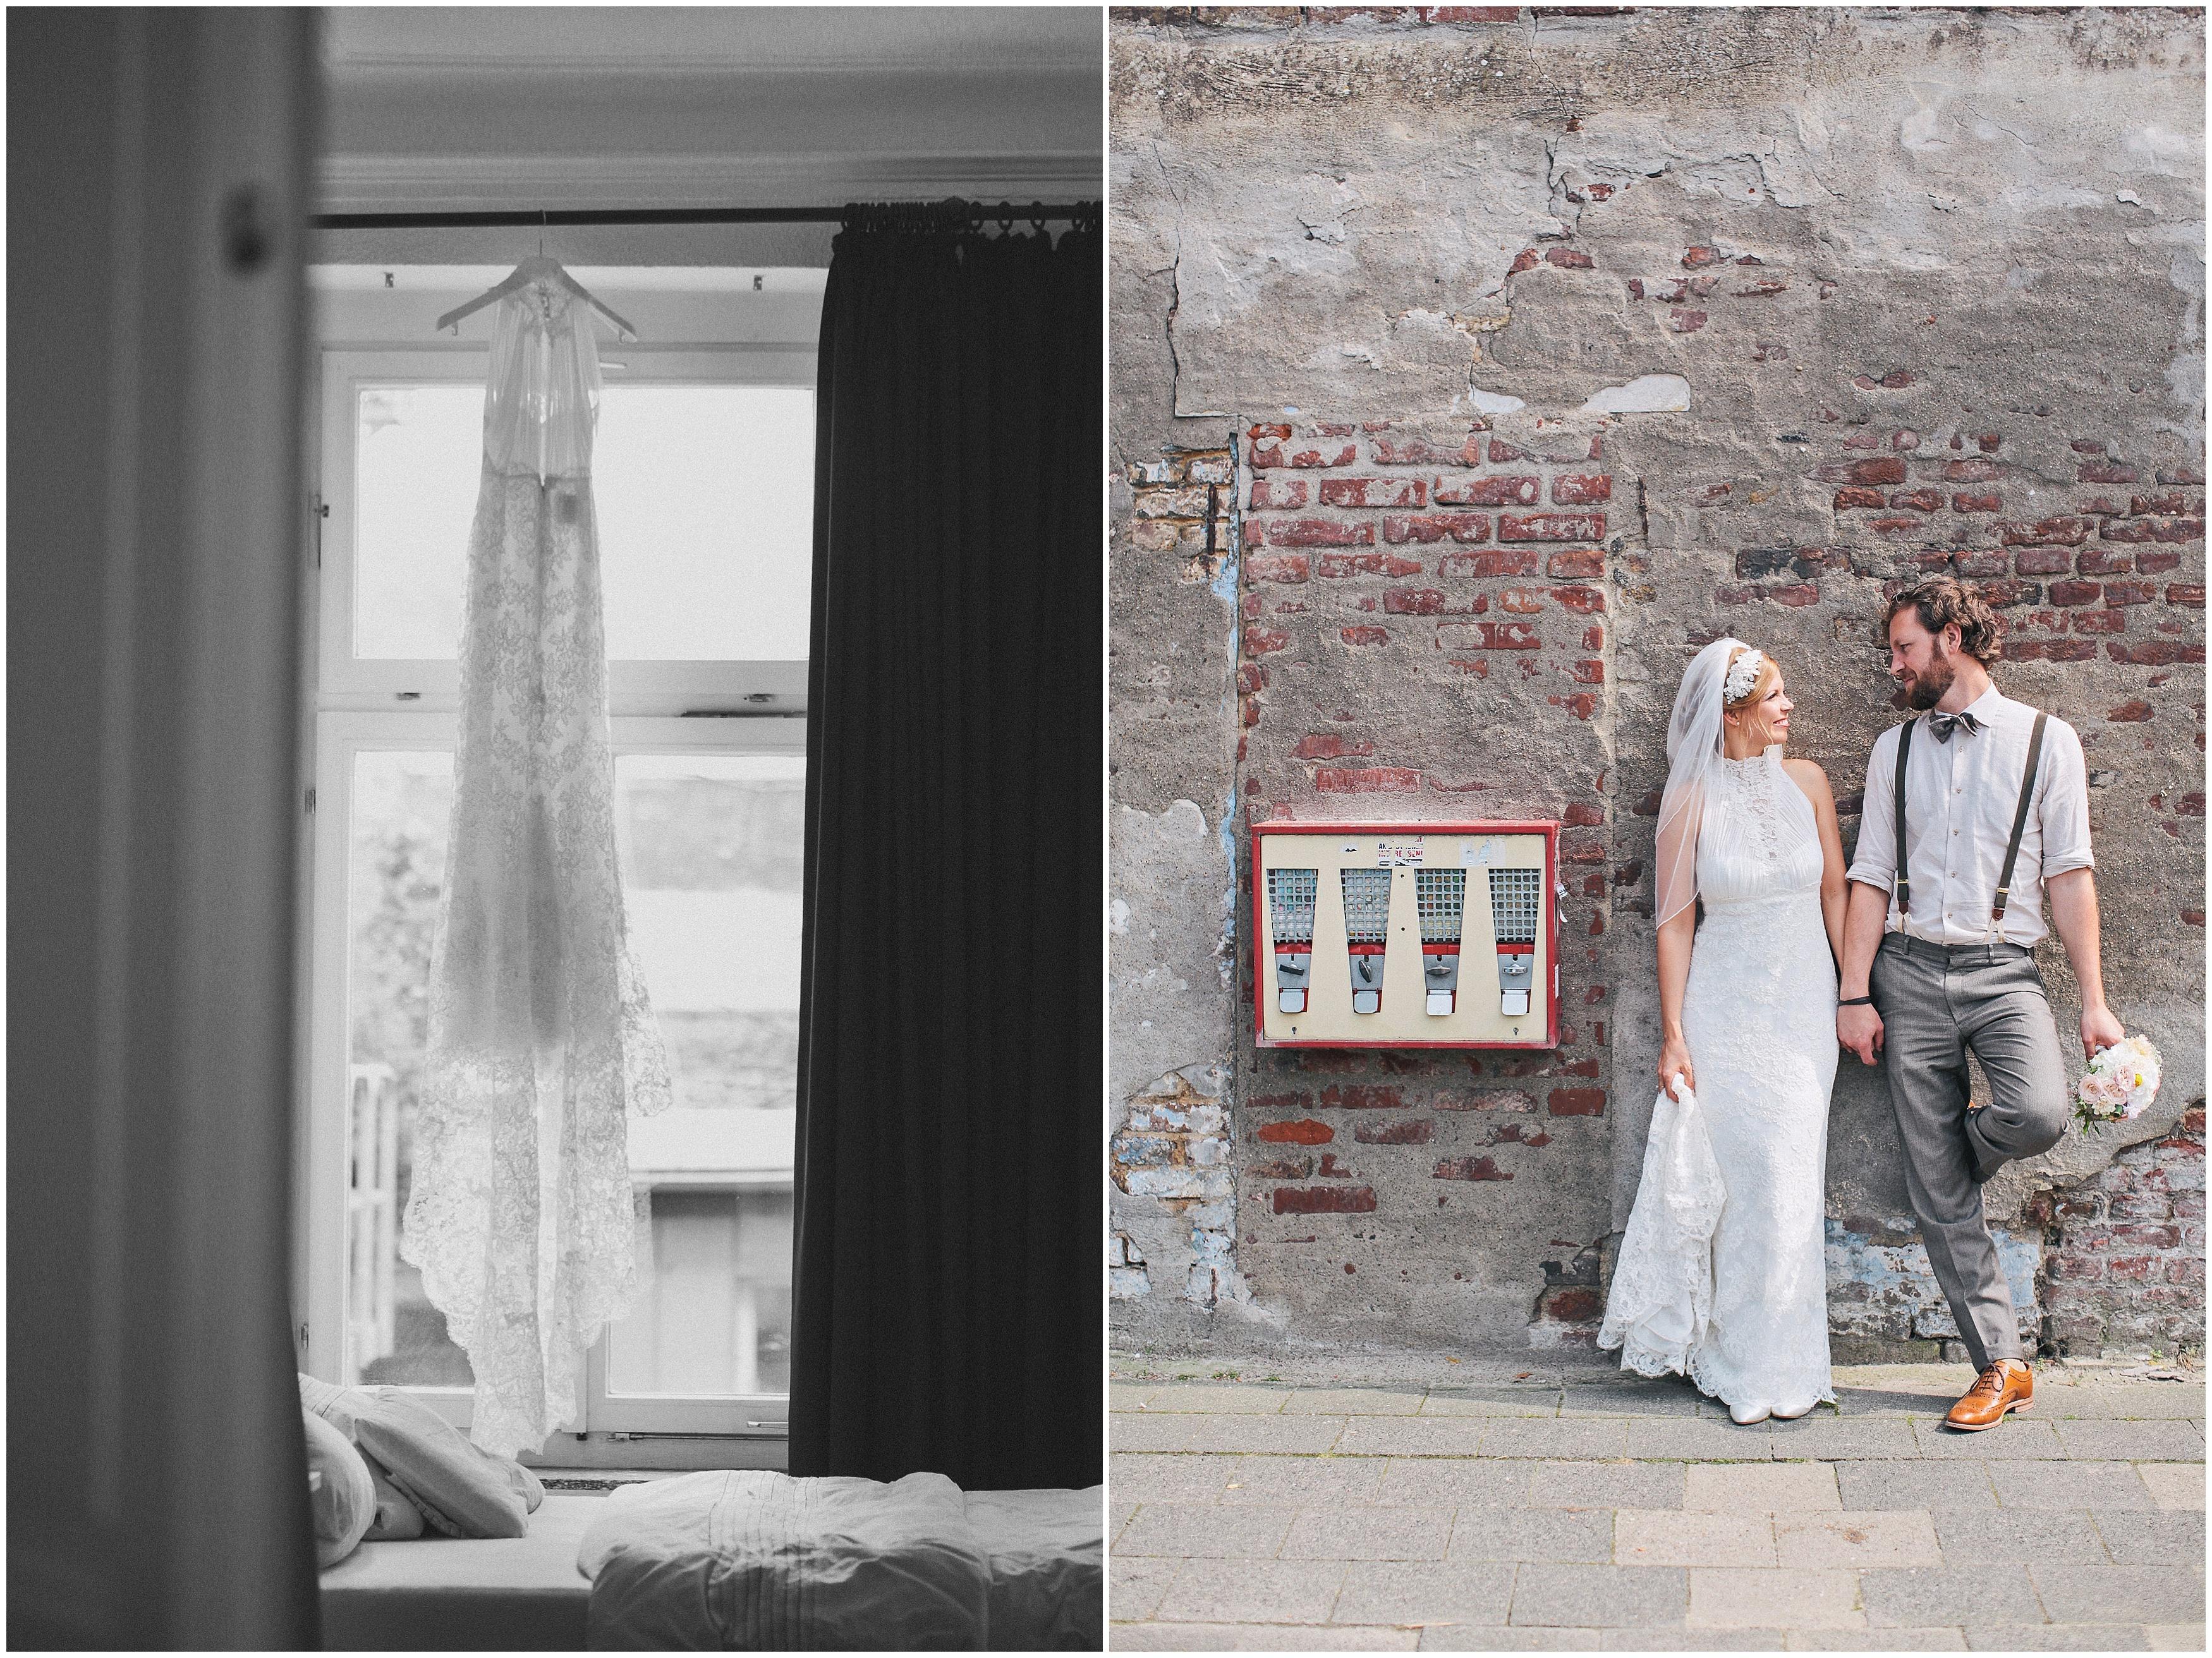 ivy&olive_Hochzeitsplanung_Nancy_Ebert_Fotografie_Vintage_Wedding_0008